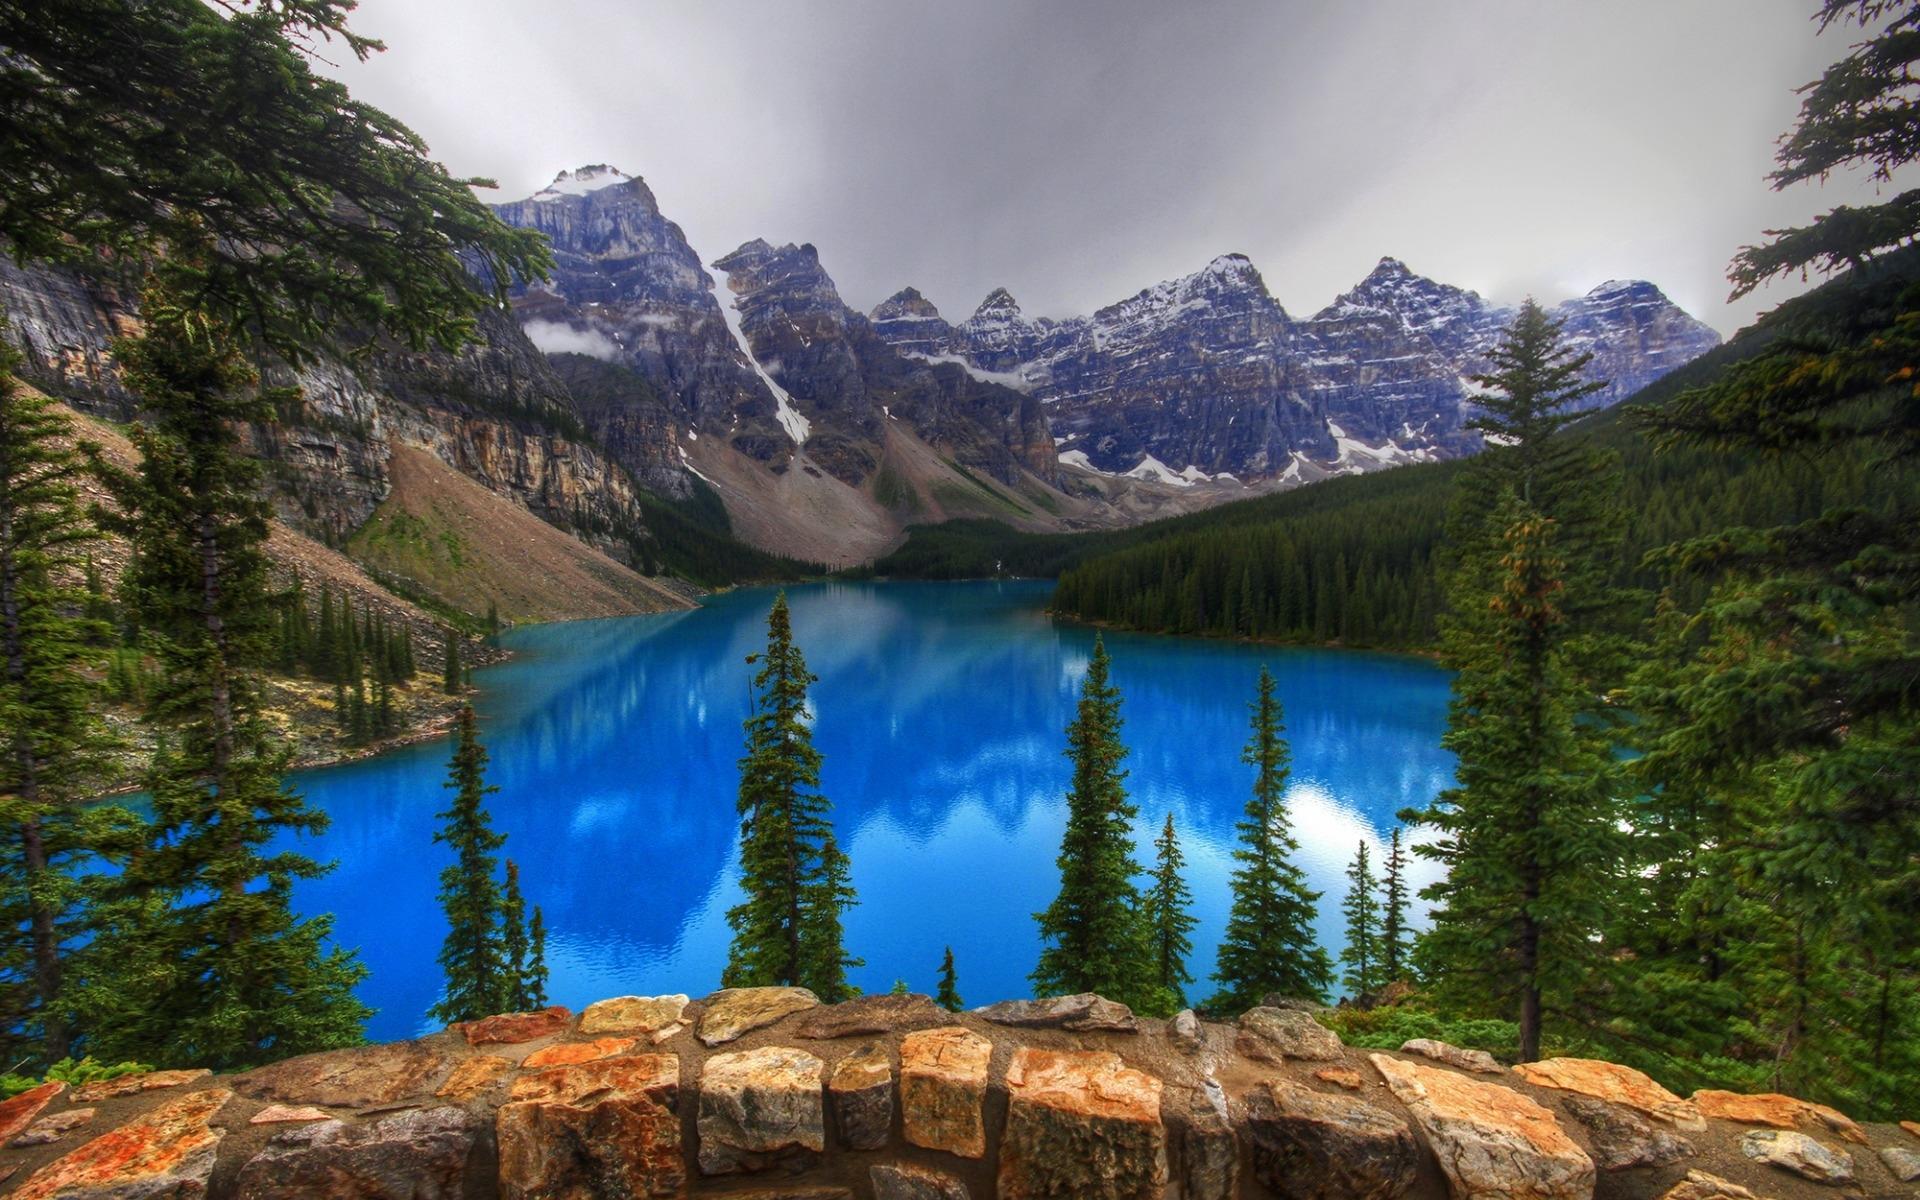 Moraine Lake Wallpaper HD Download